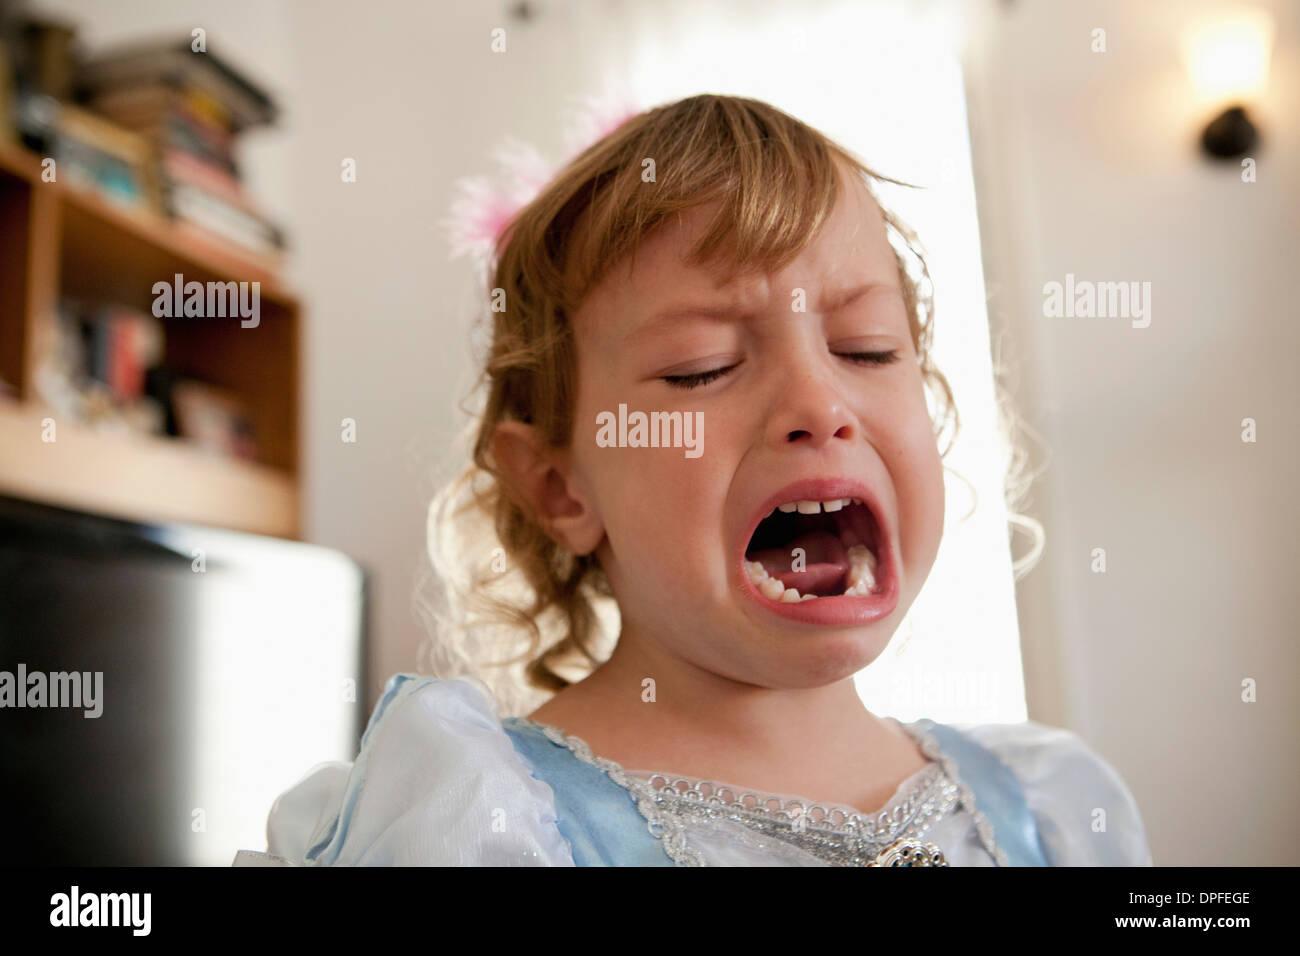 Close up of female toddler crying - Stock Image